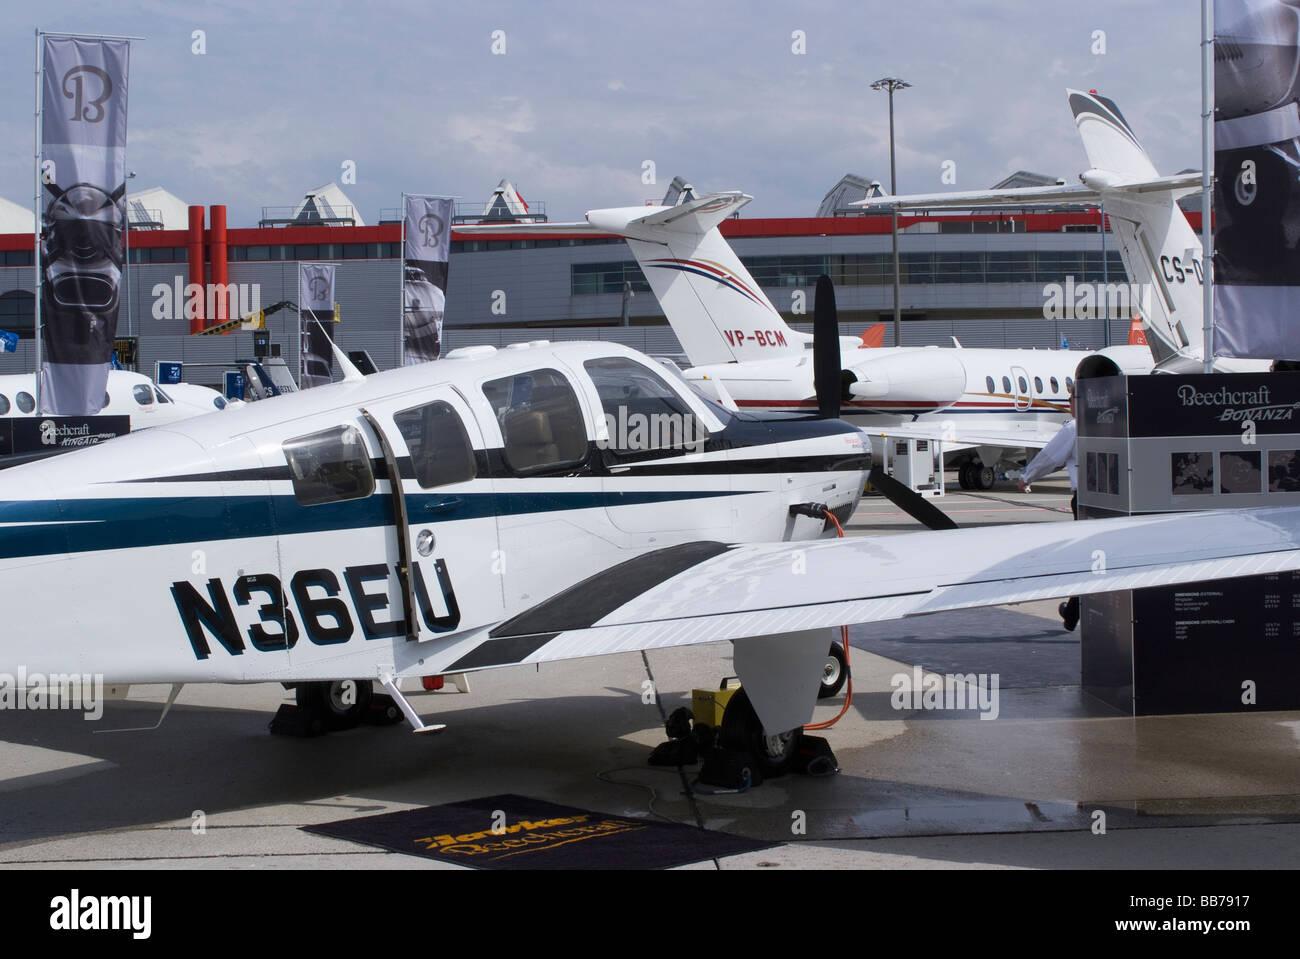 Hawker Beechcraft Beech G36 Bonanza Business Aircraft at EBACE Aircraft Trade Show at Geneva Airport Switzerland - Stock Image